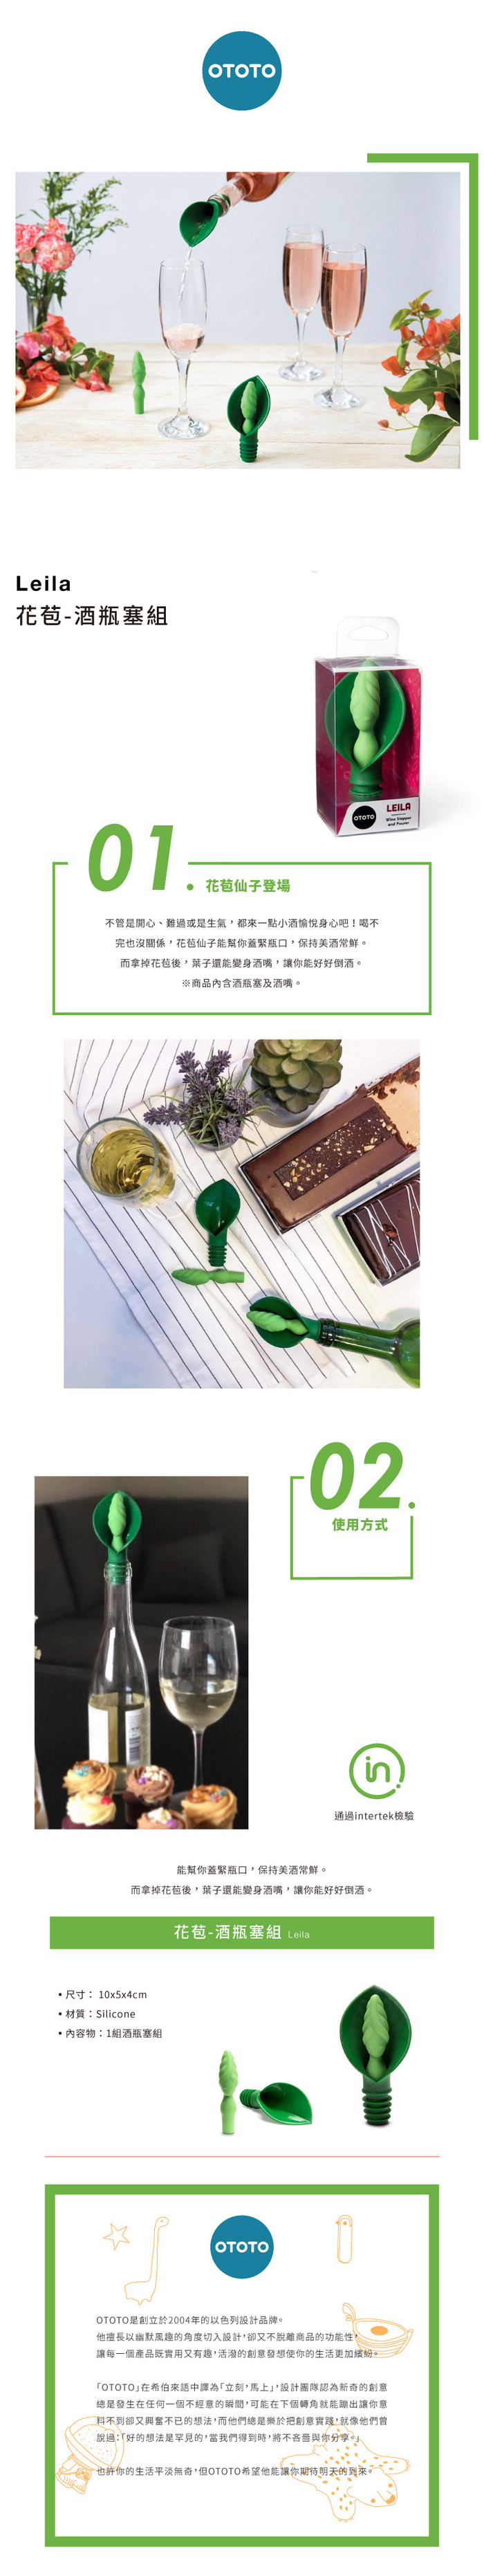 OTOTO|花苞-酒瓶塞組